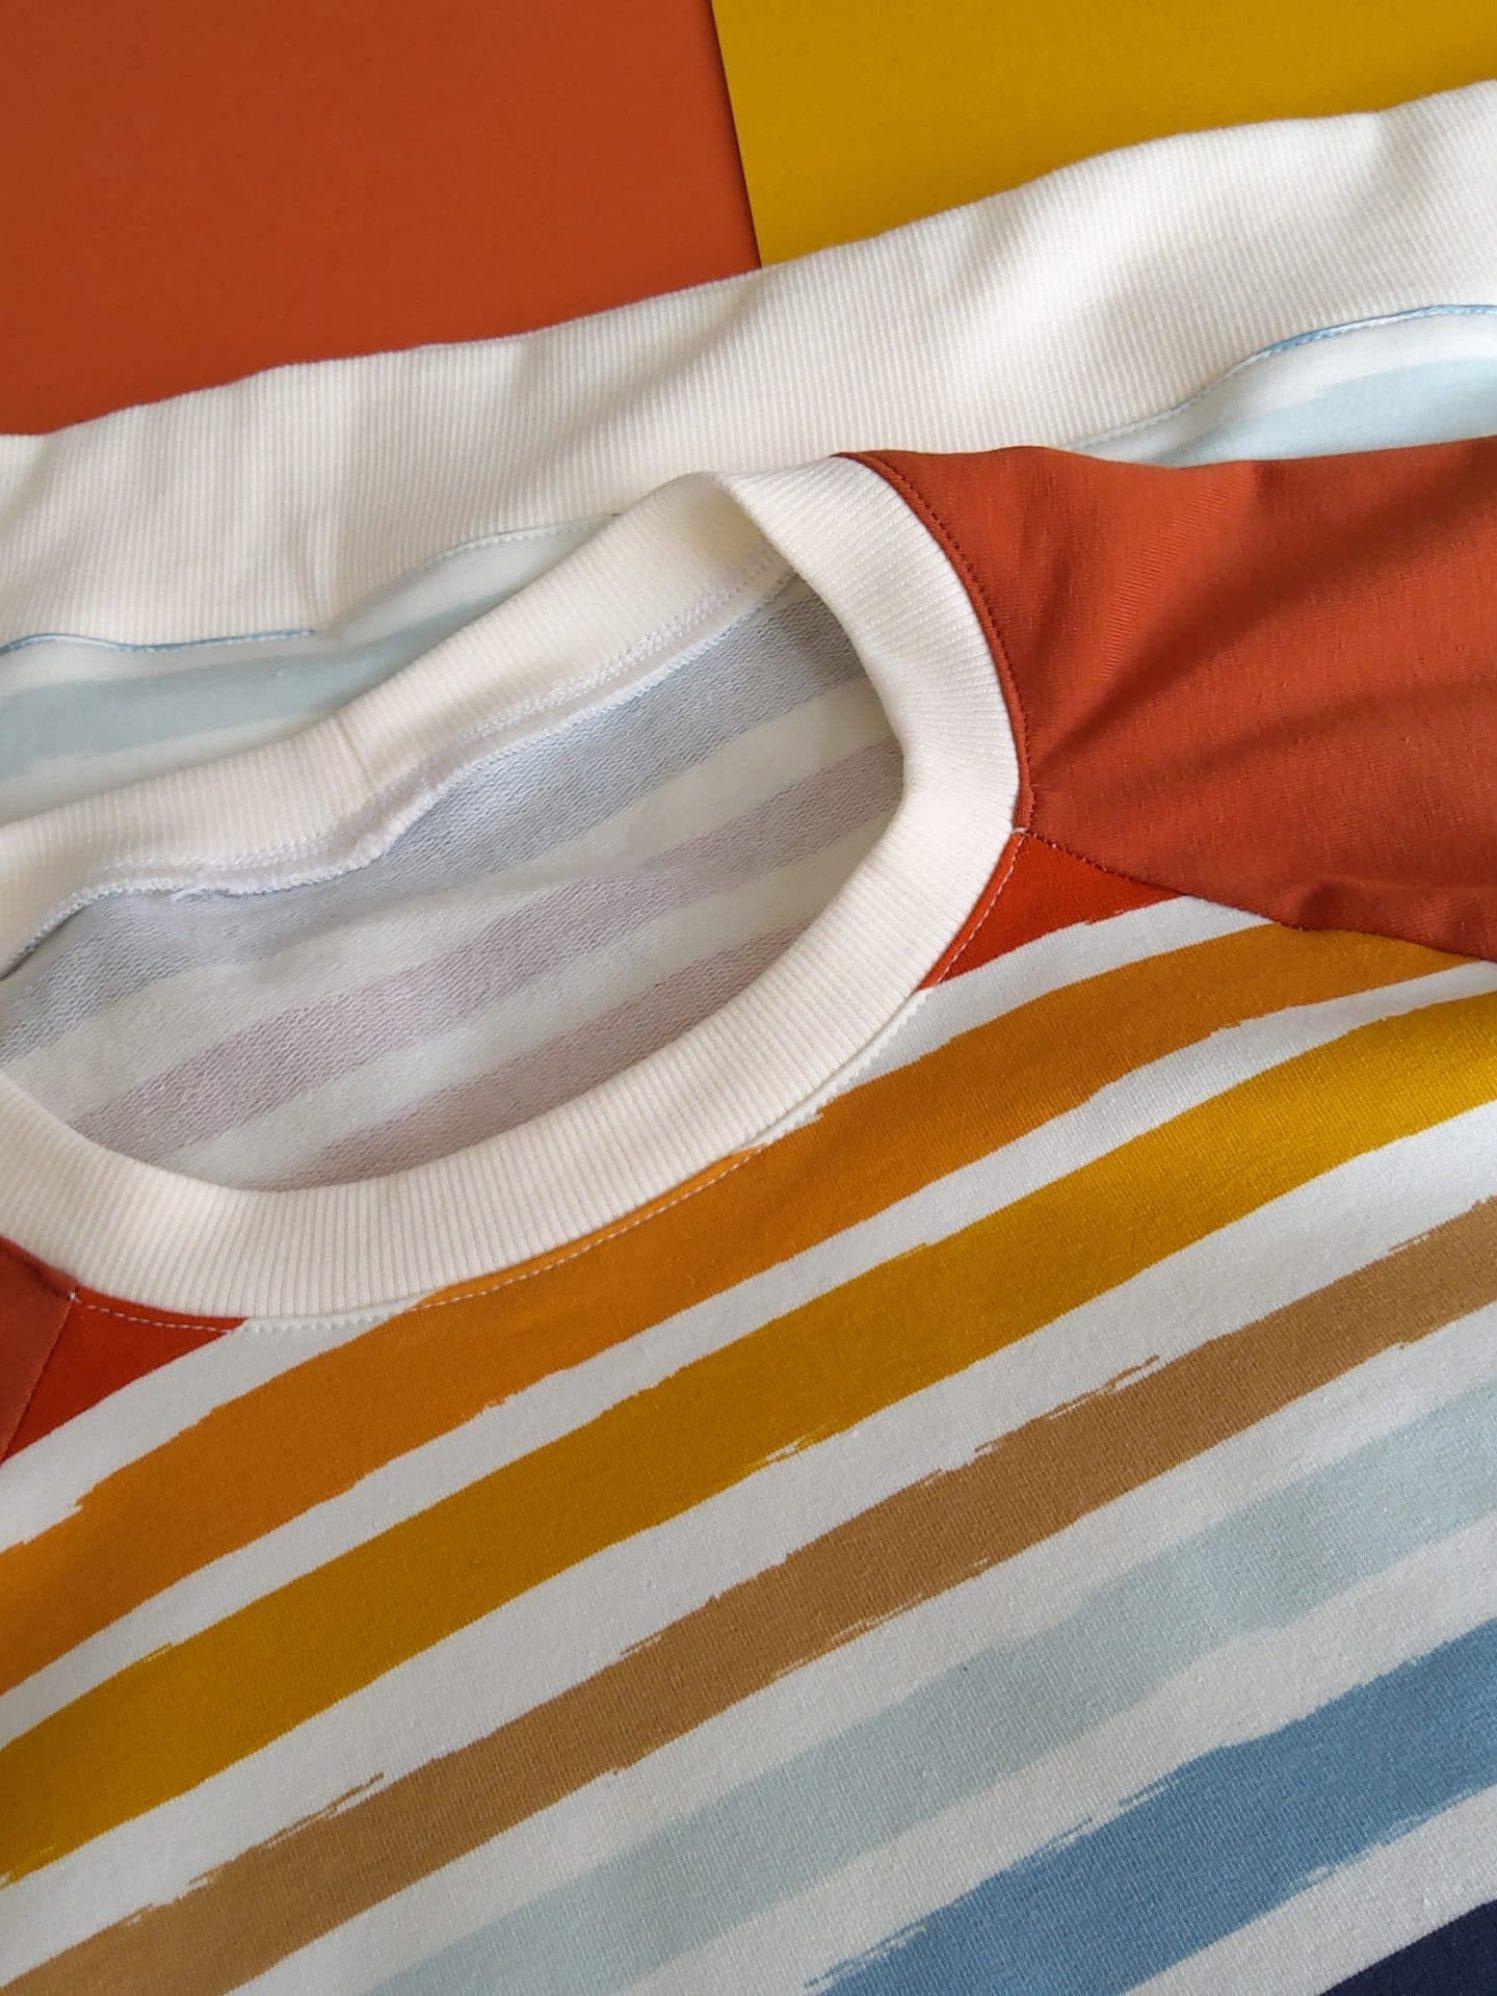 T-shirt homme, motif rayure, en coton bio